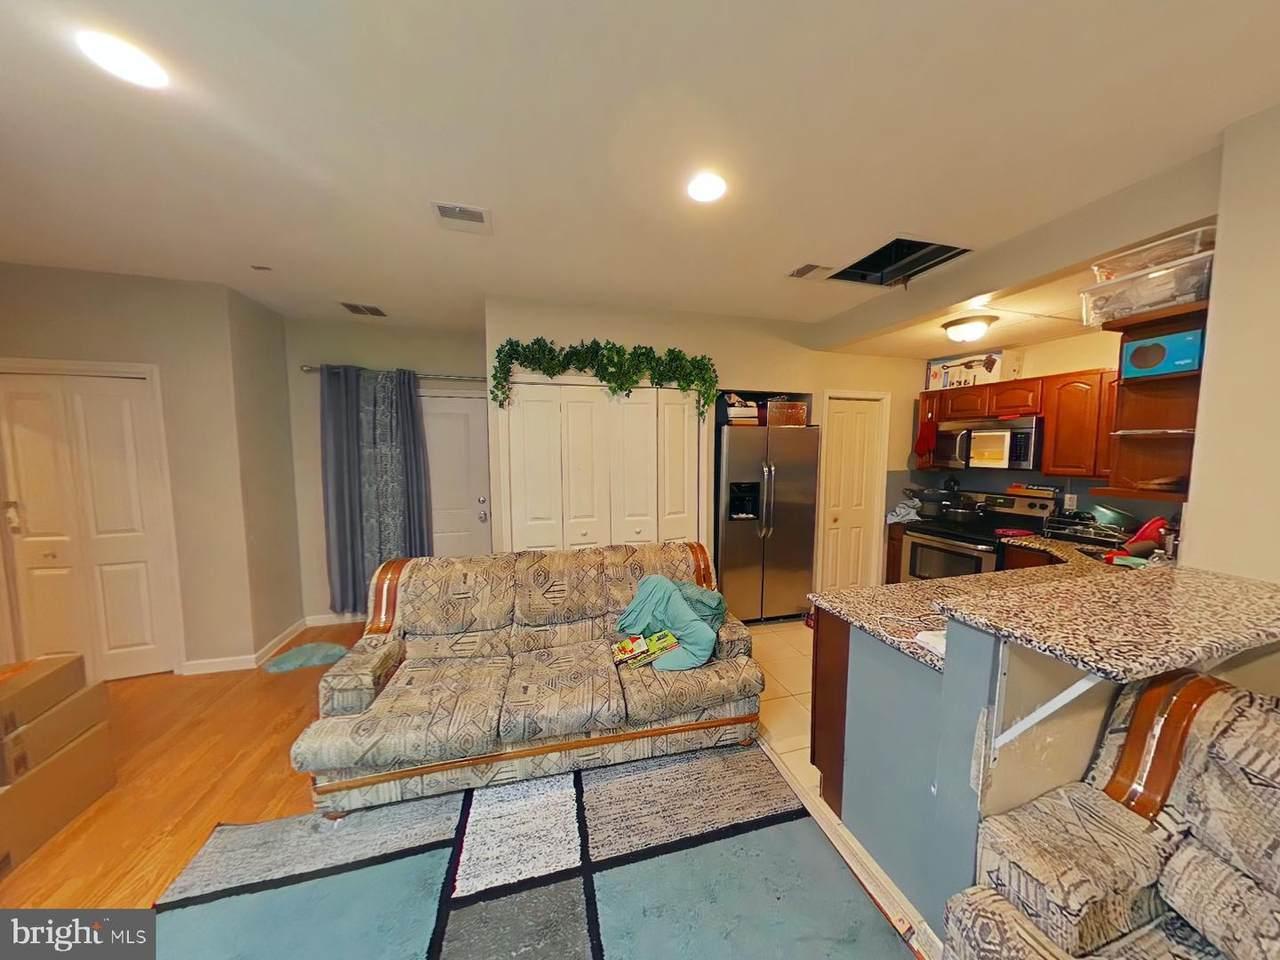 6174-82 Ridge Avenue - Photo 1